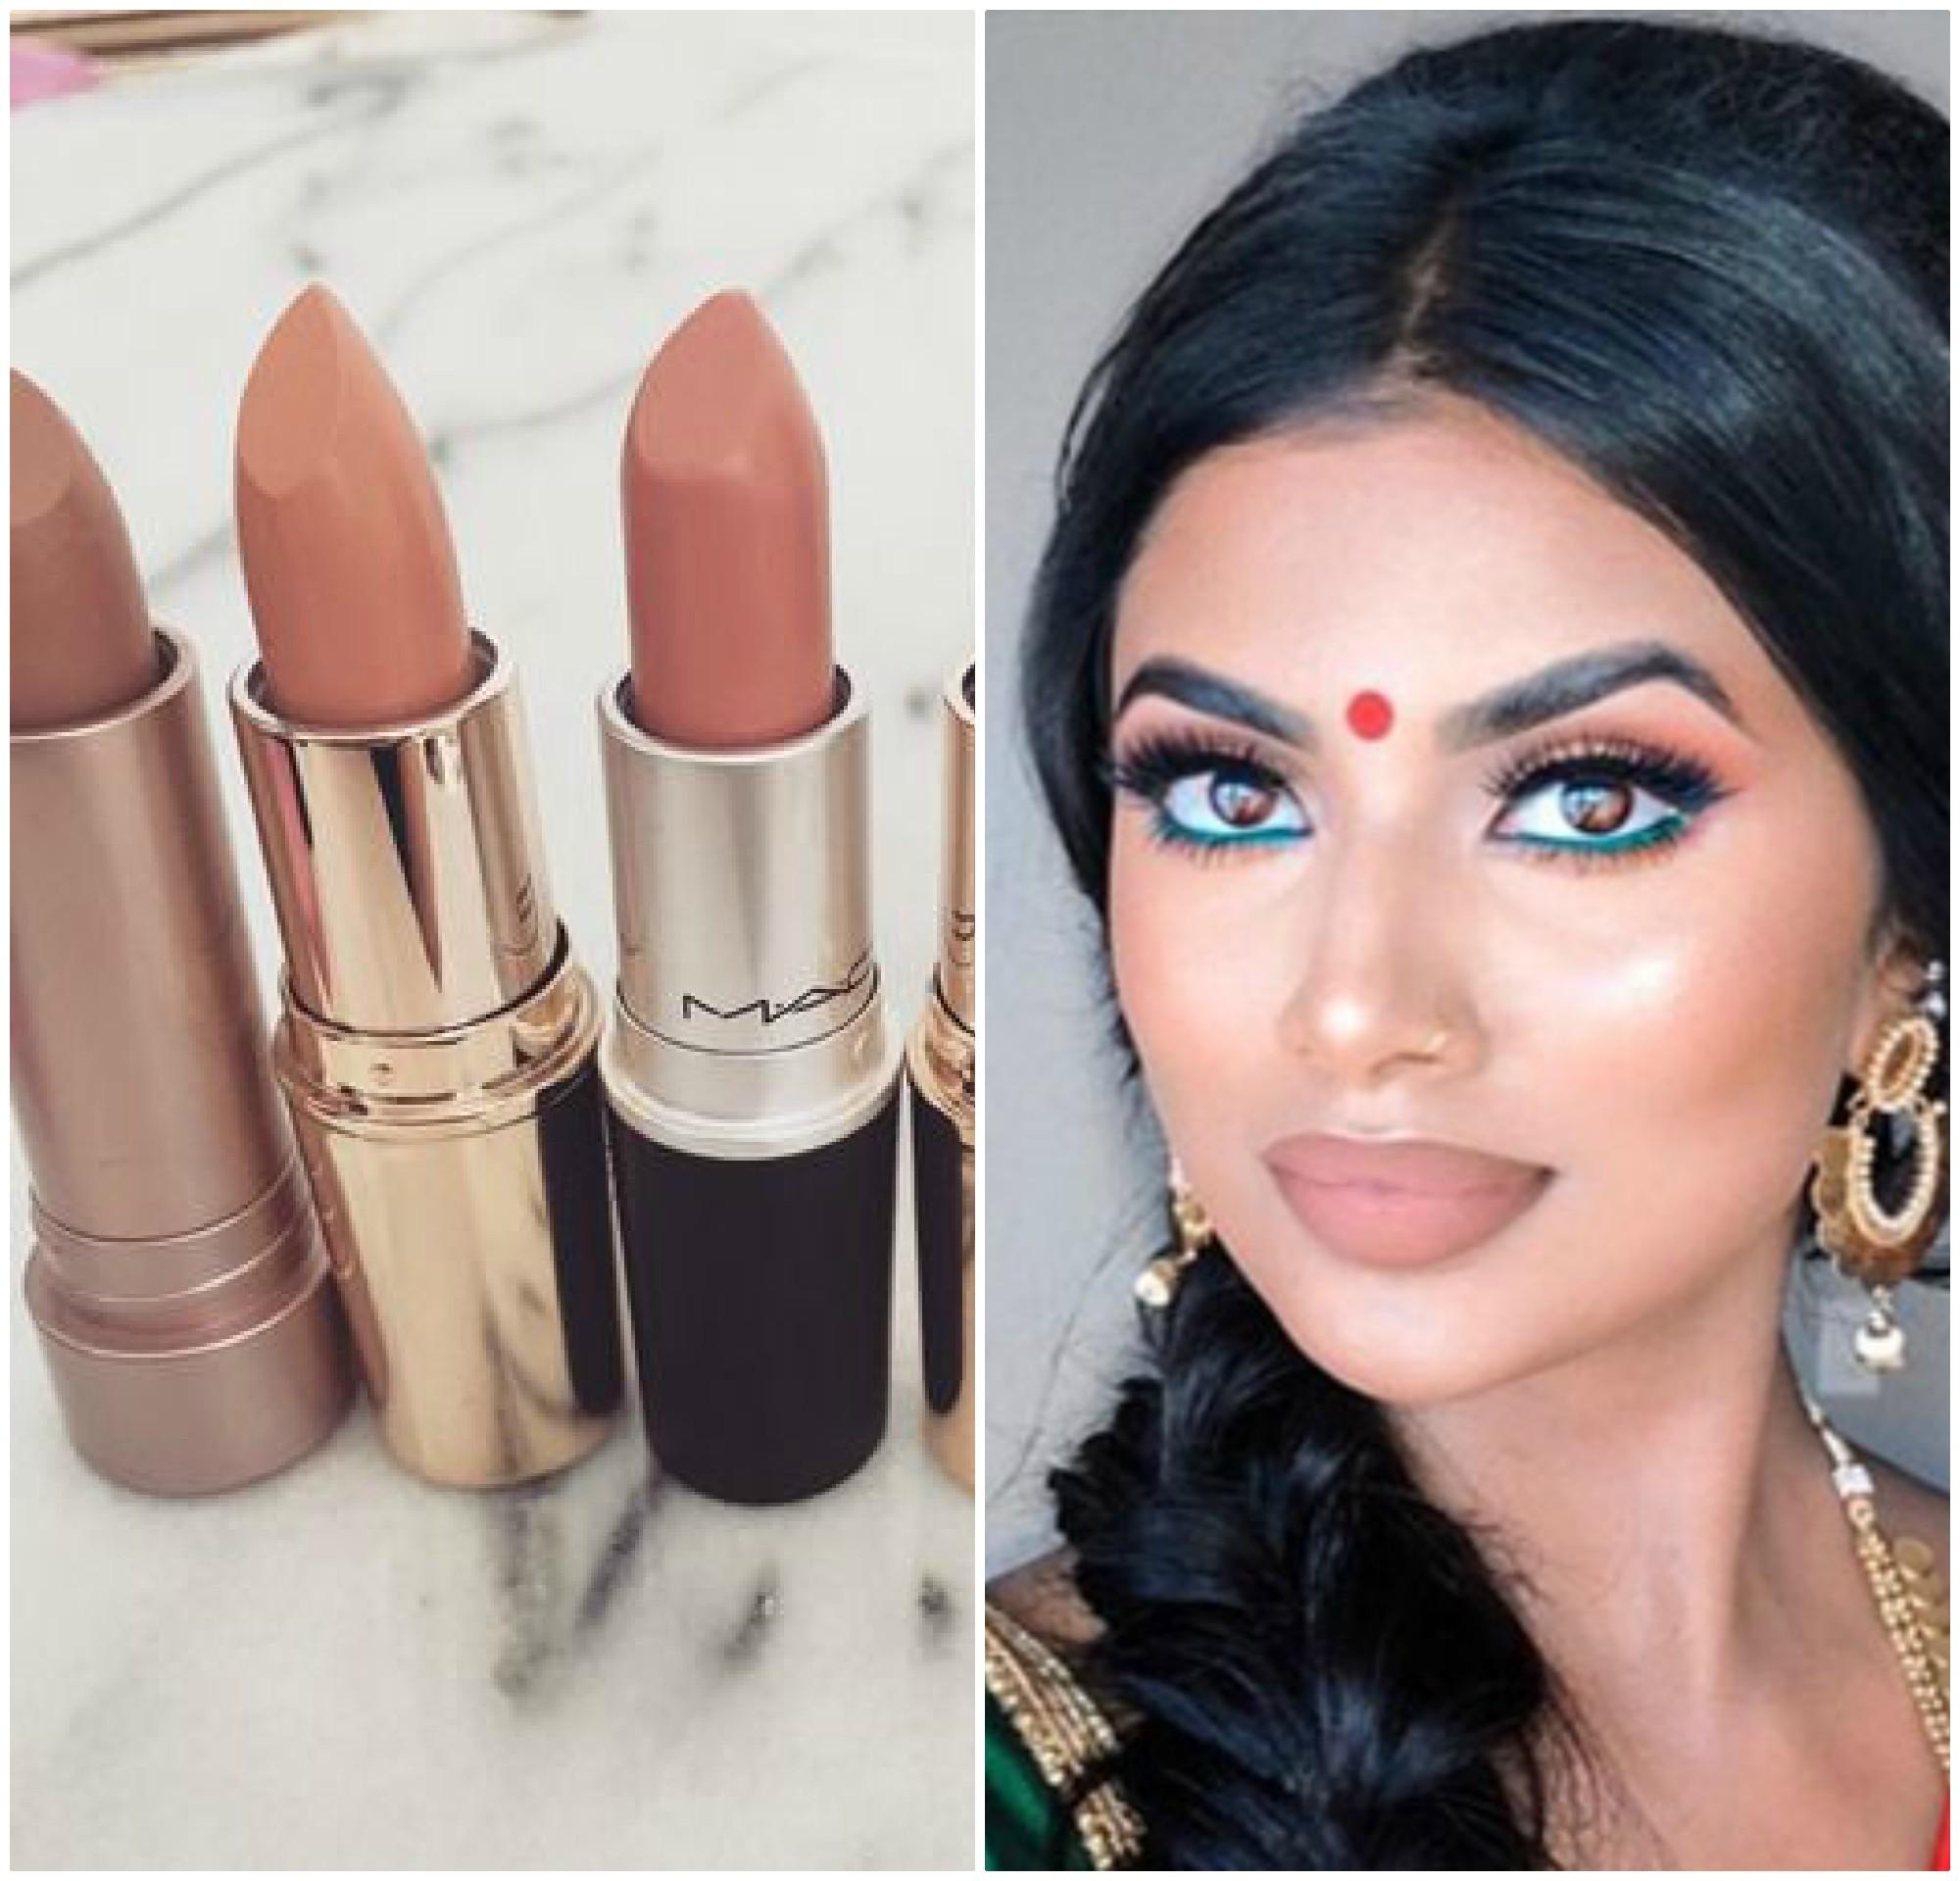 PunjabKesari, Nari, Classy nude Lipstick image